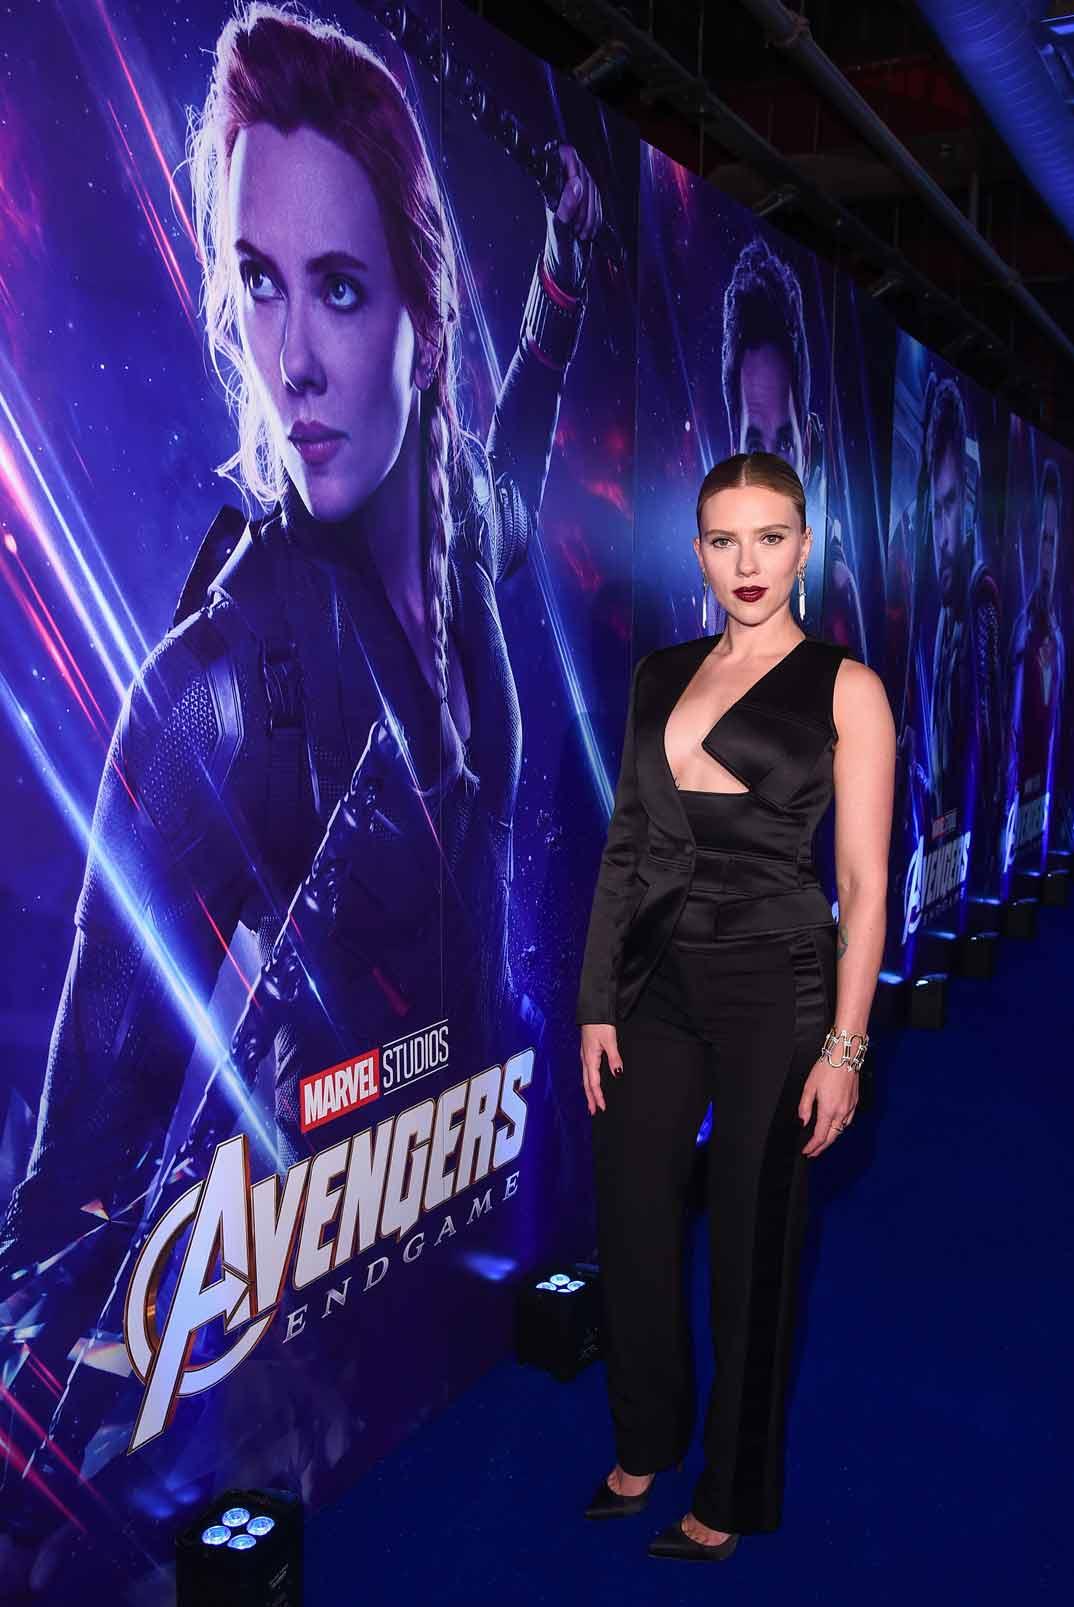 Scarlett Johansson - Estreno 'Los Vengadores: Endgame' Londres